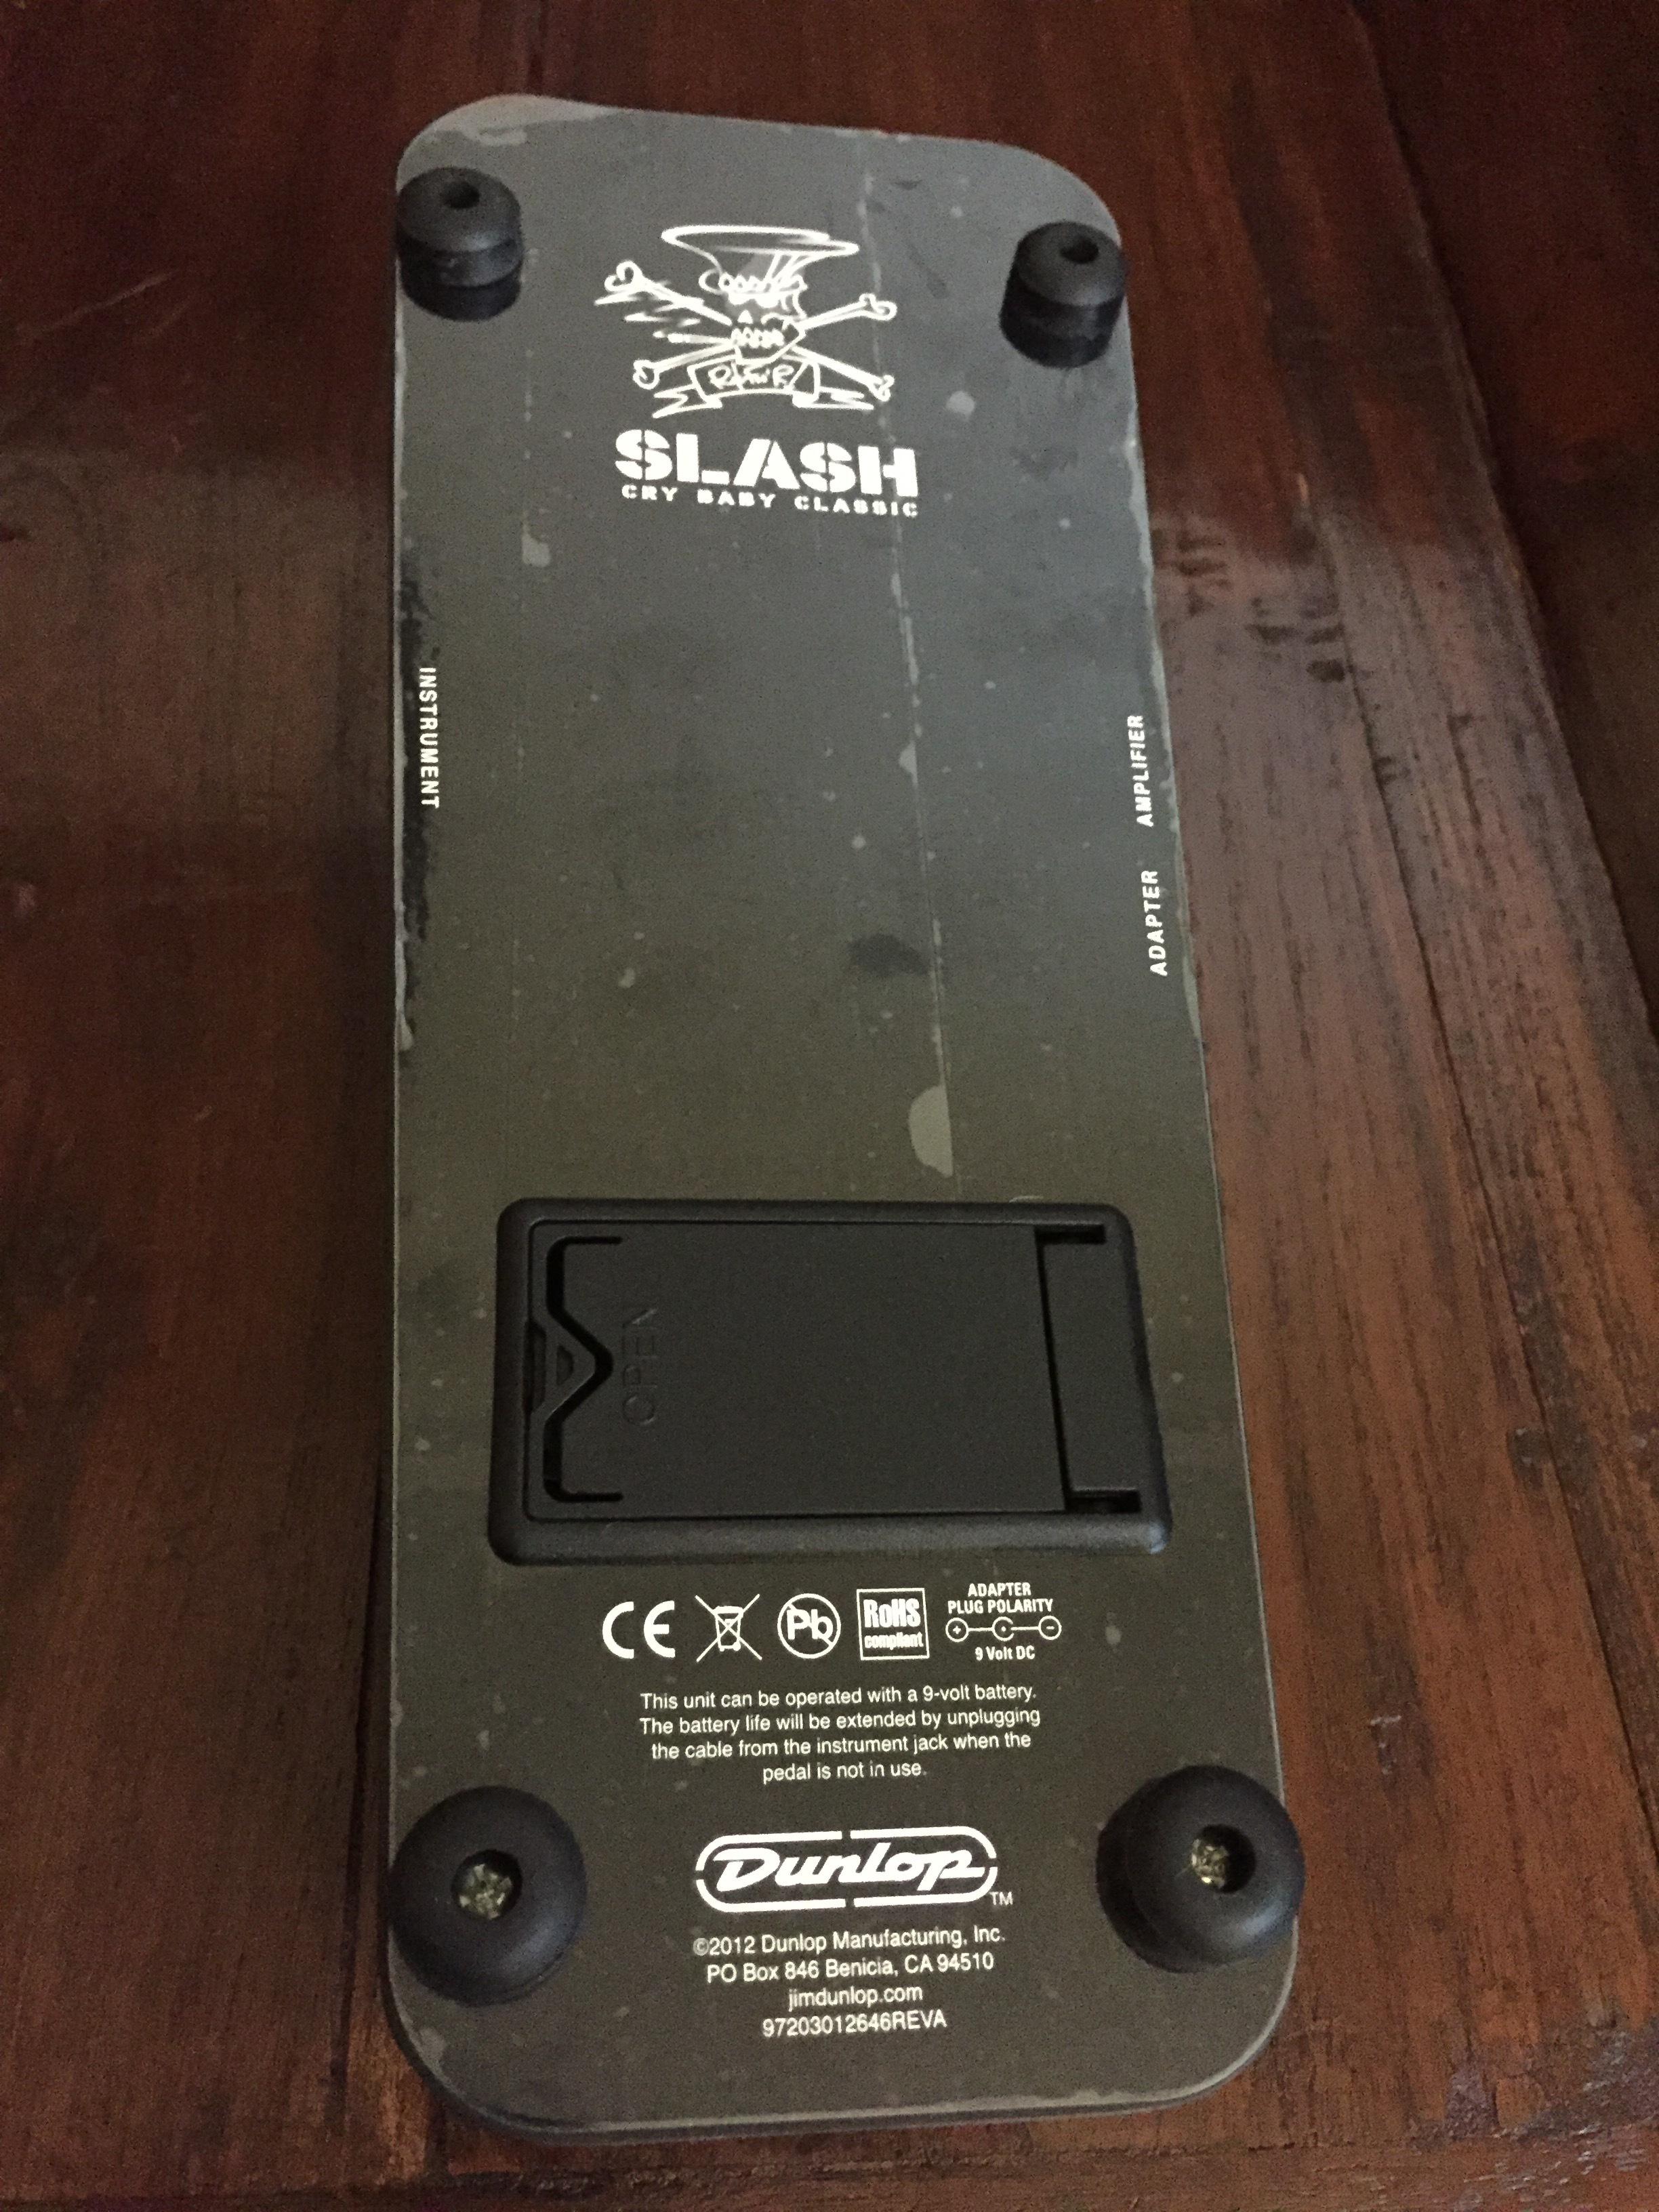 Sc95 Slash Cry Baby Classic Dunlop Audiofanzine